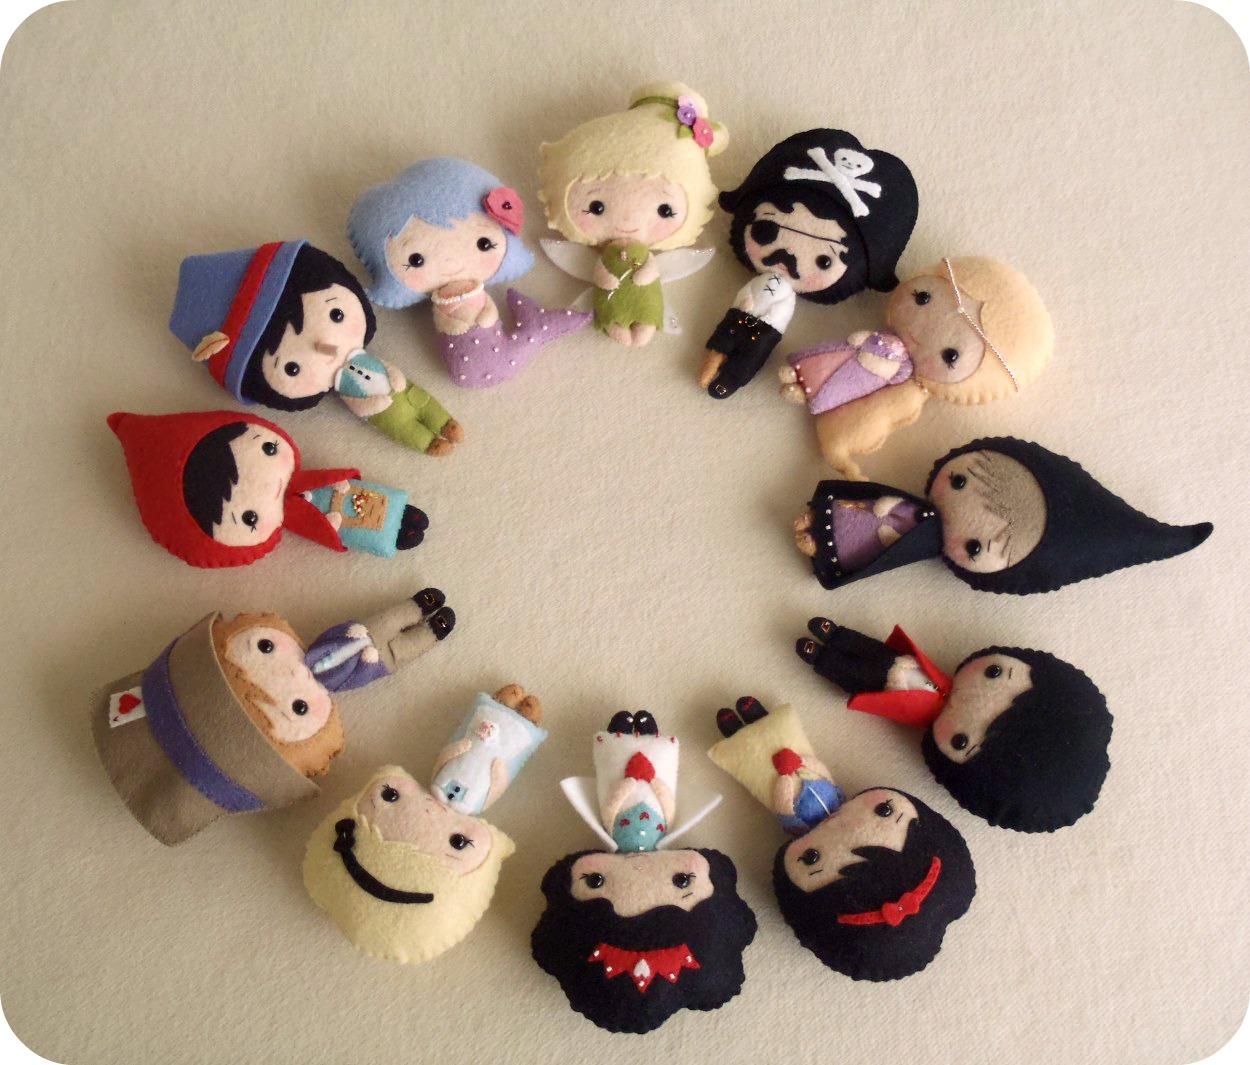 Mooshka Dolls Fairy Tale